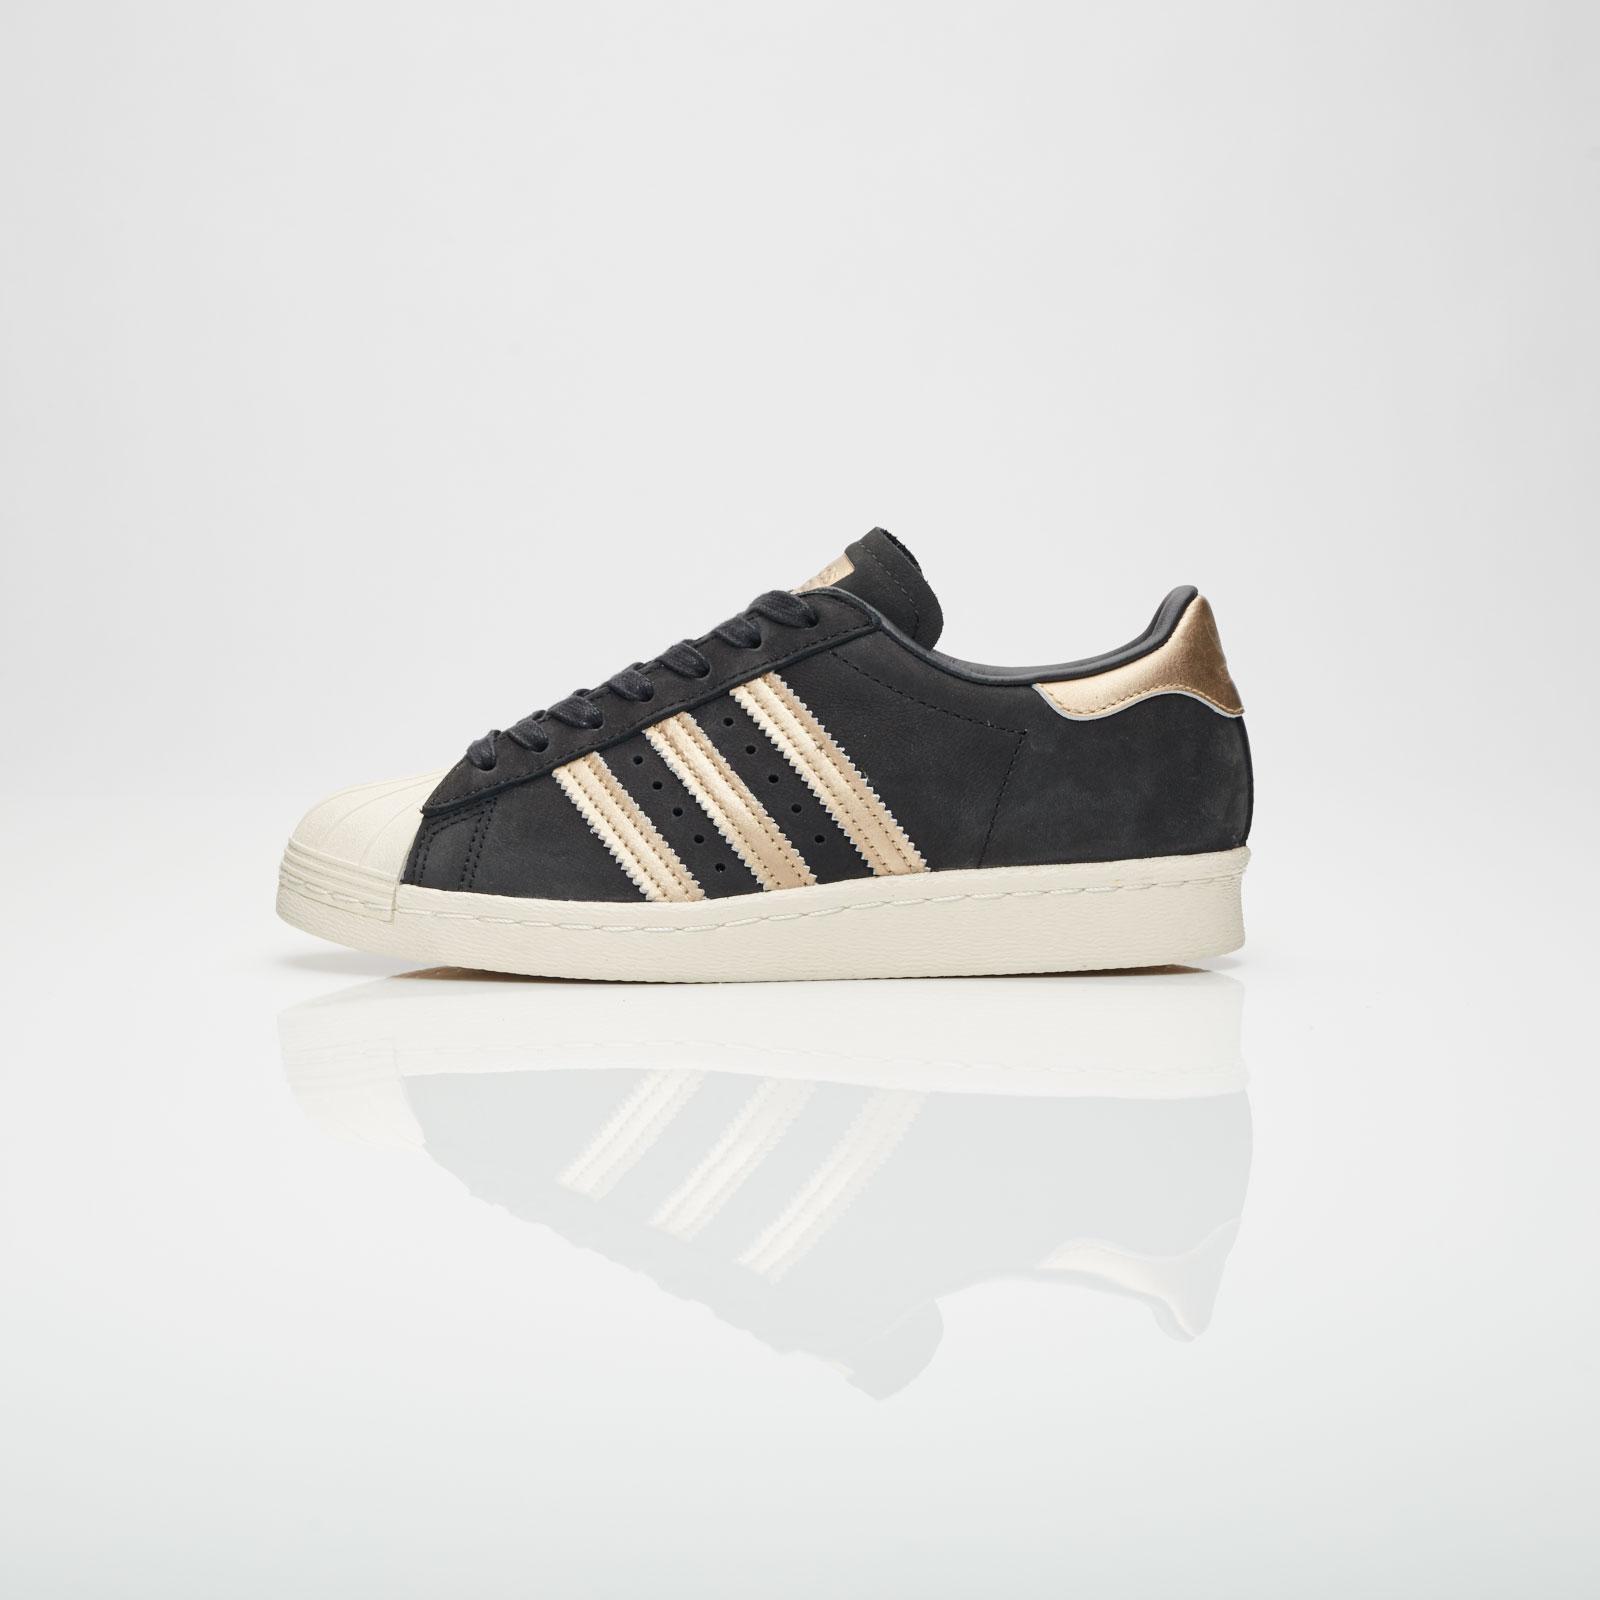 adidas Superstar 80s 999 W - By9635 - SNS   sneakers & streetwear ...